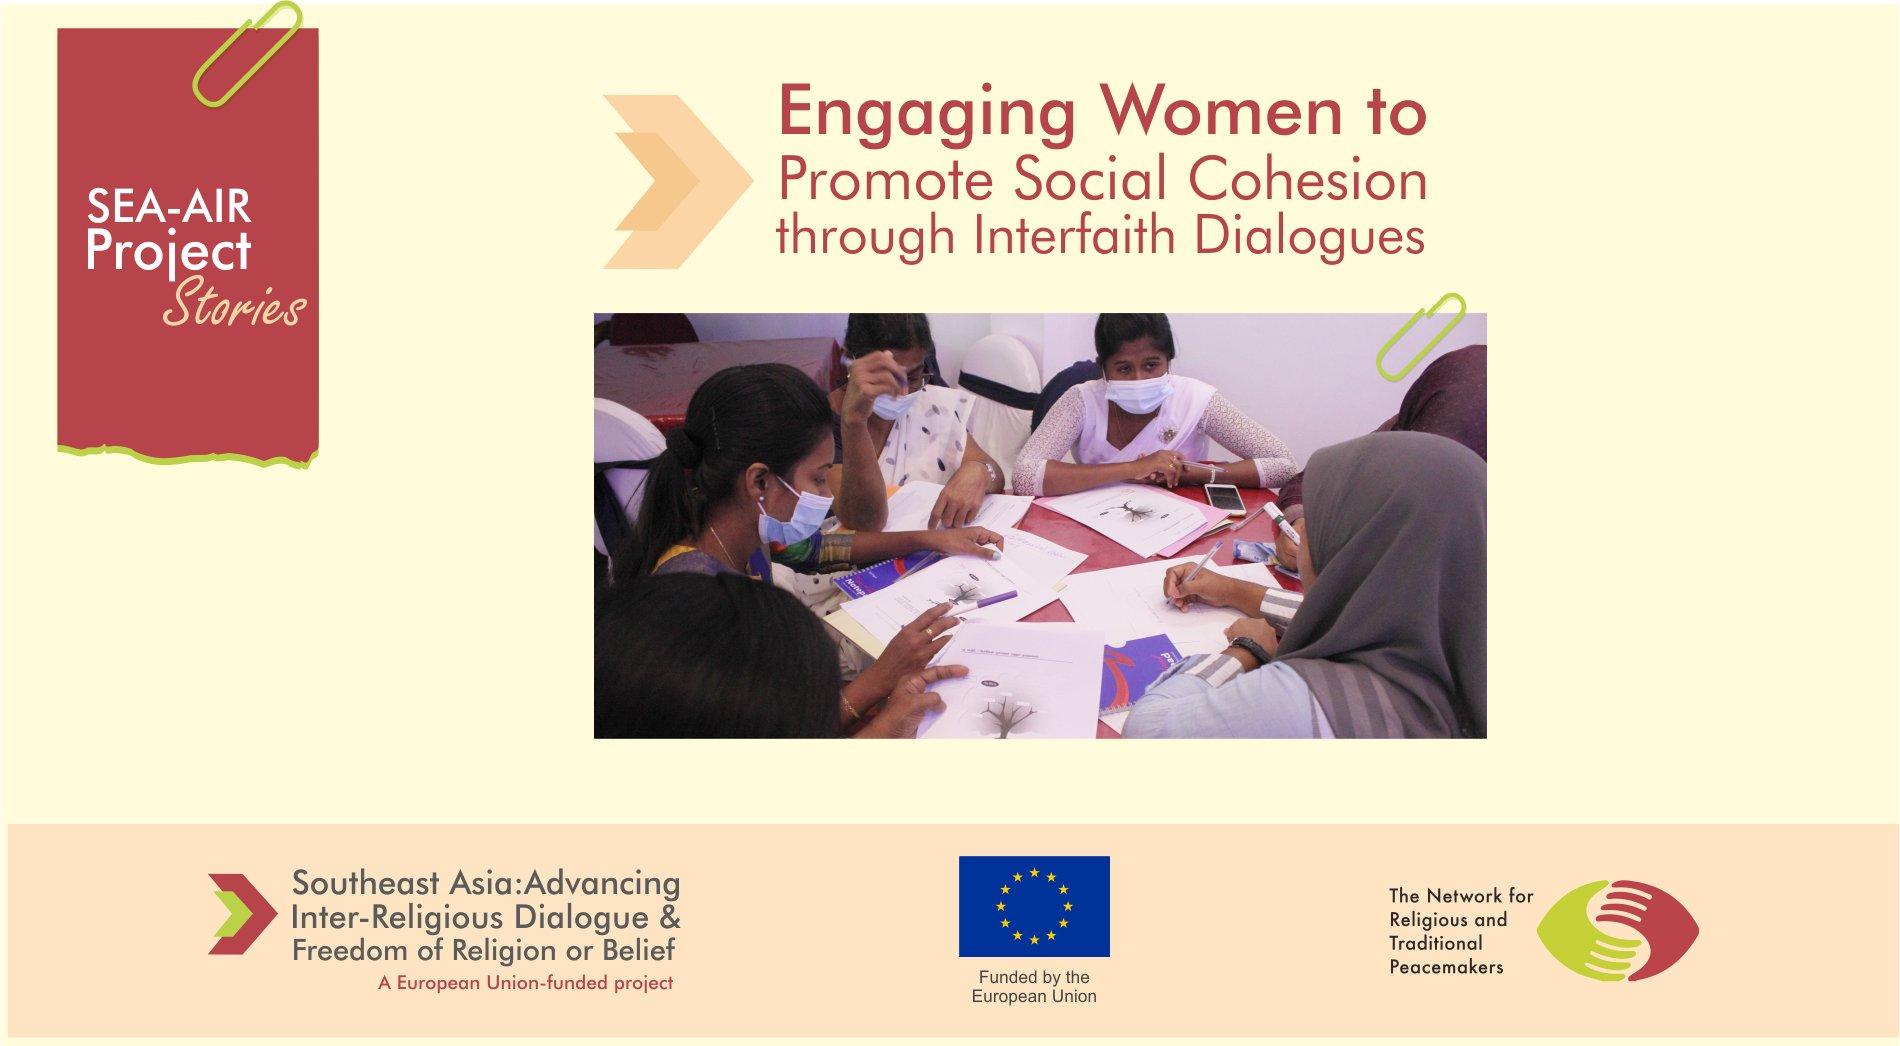 Engaging Women